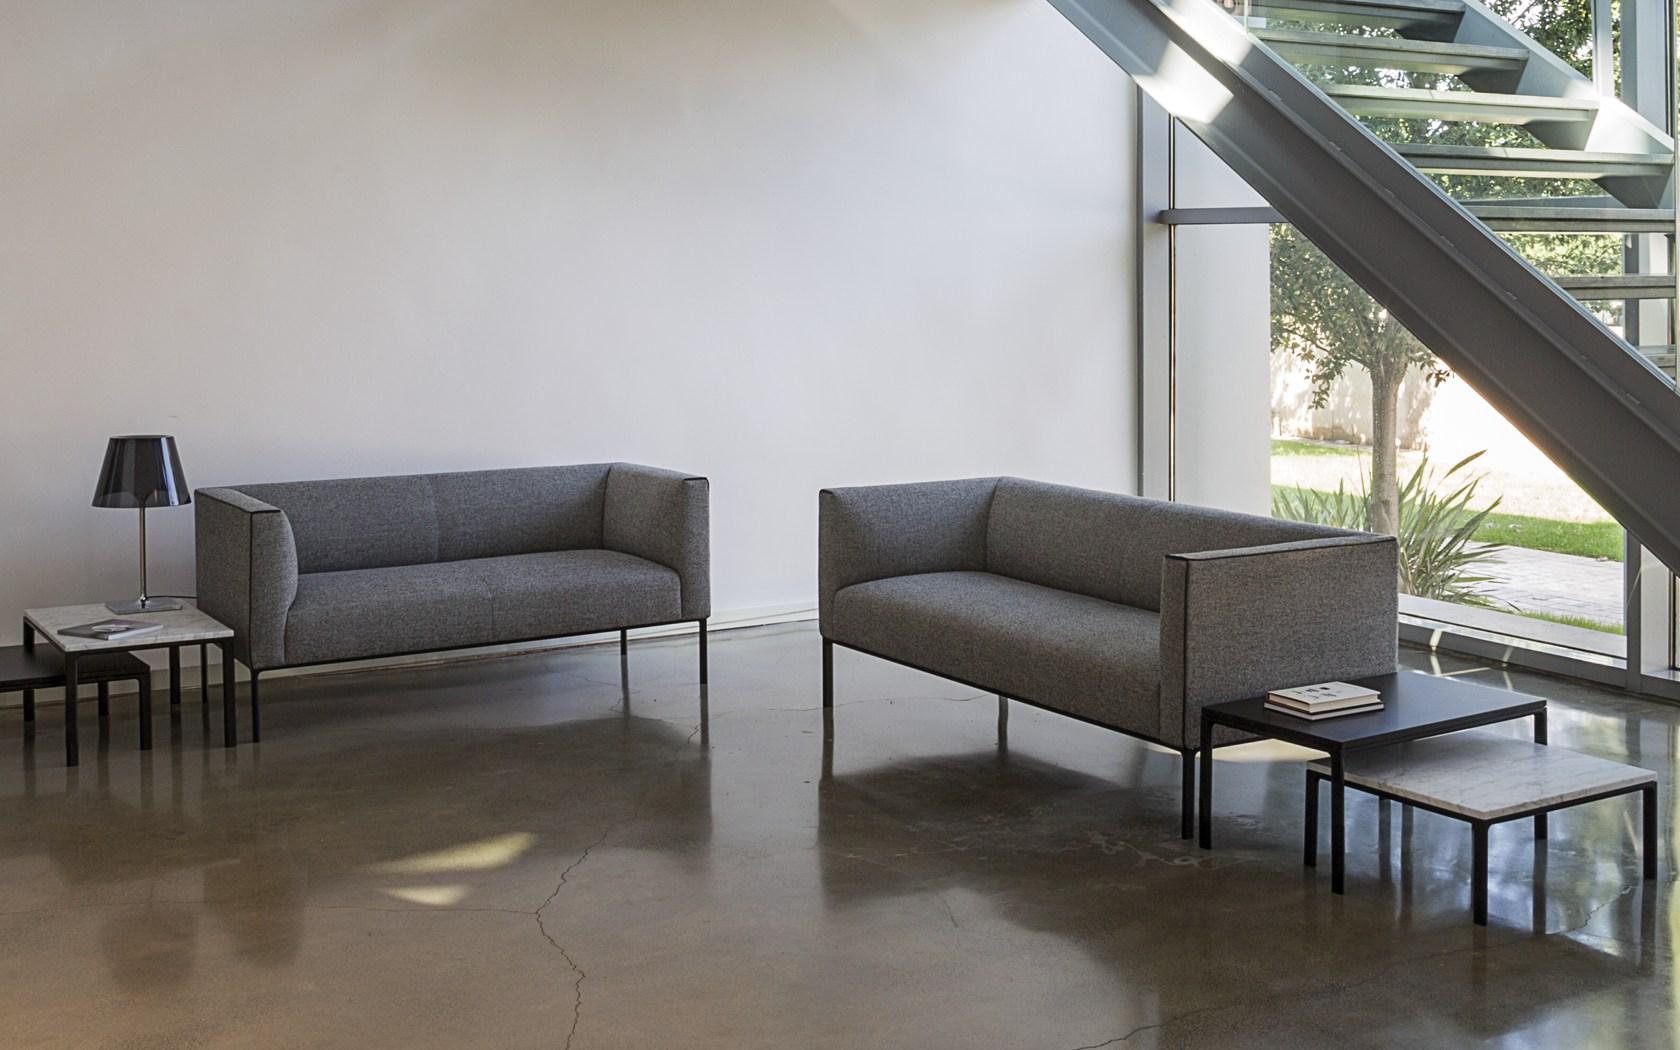 Raglan Collection by Piergiorgio Cazzaniga for Andreu World